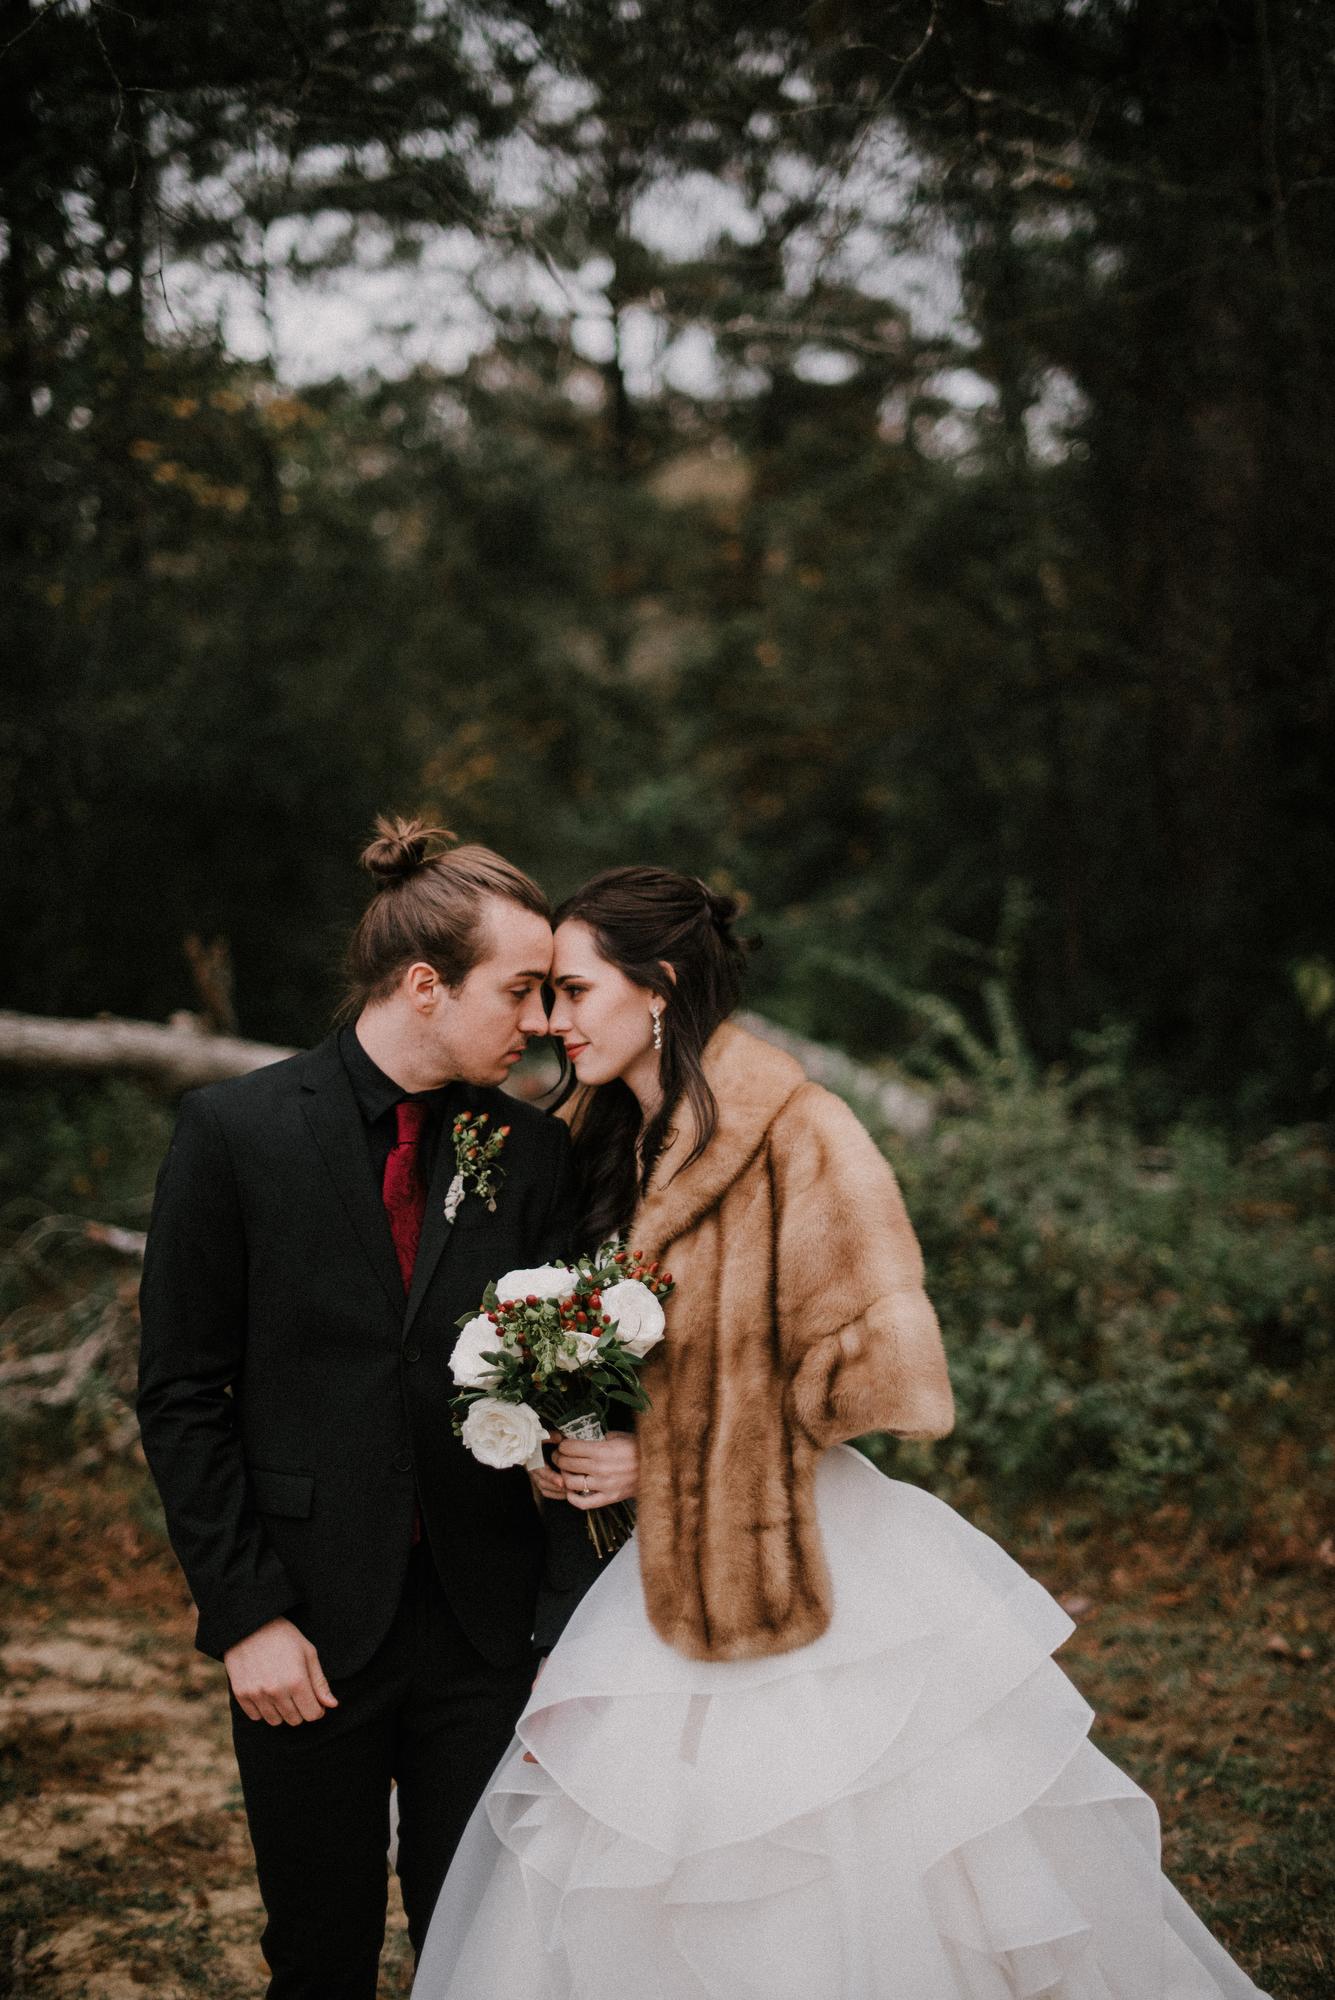 ofRen_weddingPhotos025.JPG